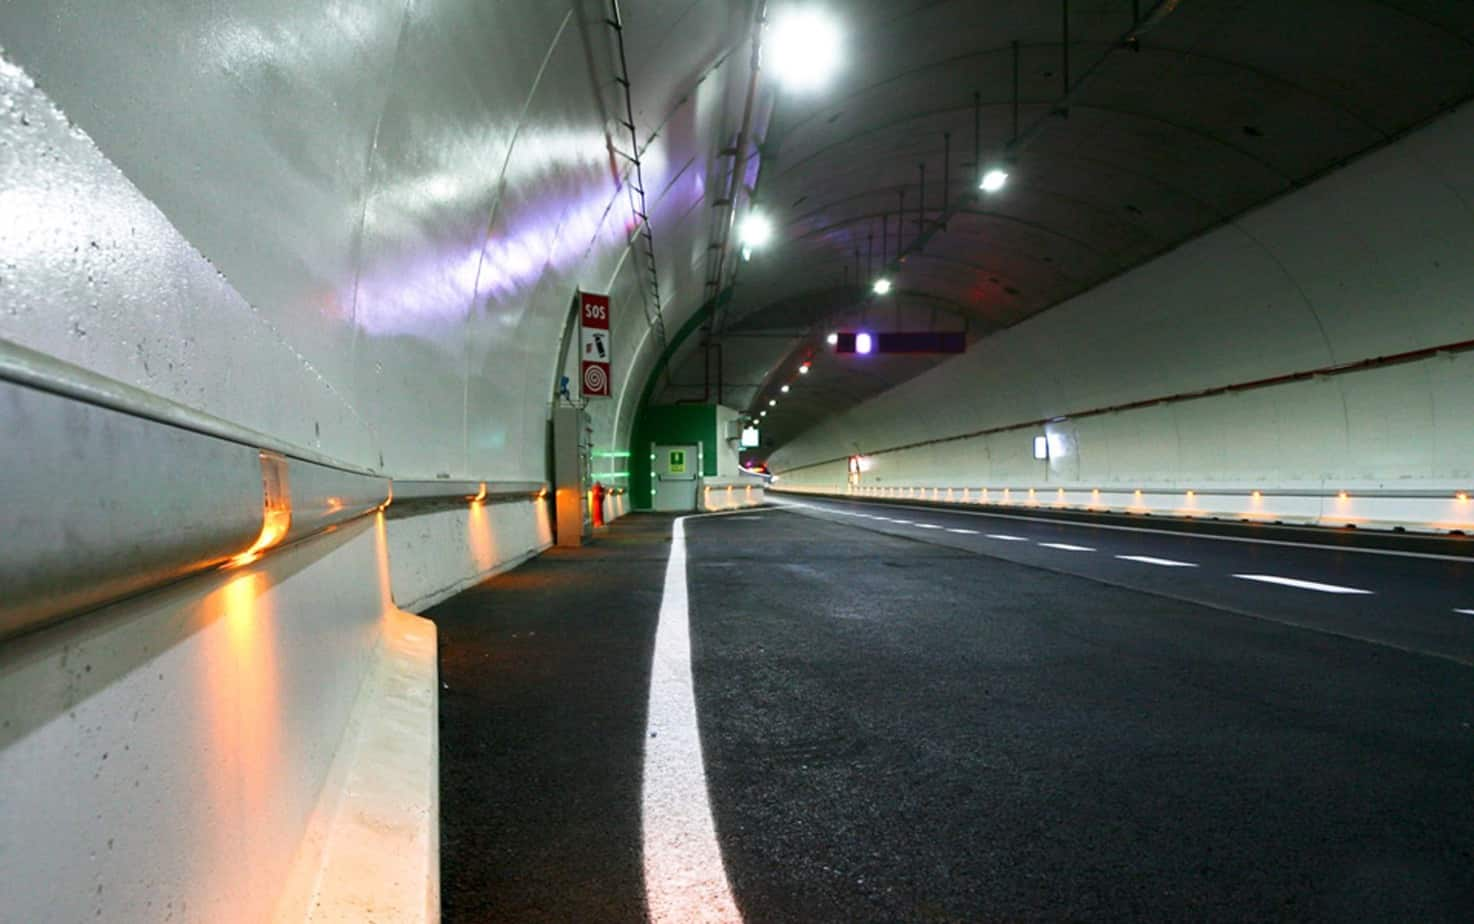 I LED incorporati nei profili redirettivi